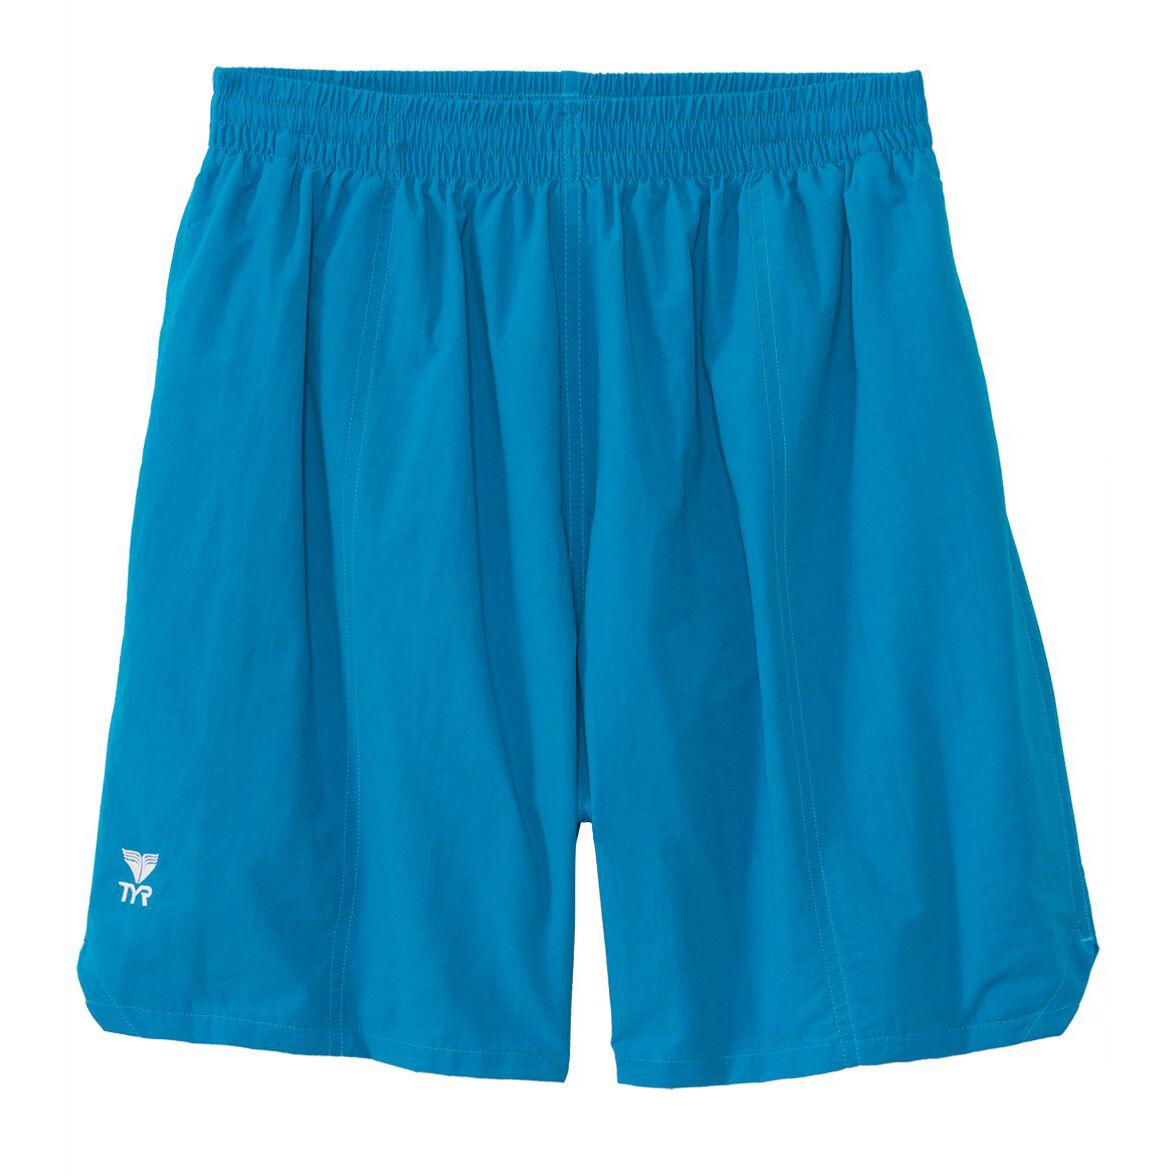 TYR Mens Classic Deck Swim Shorts